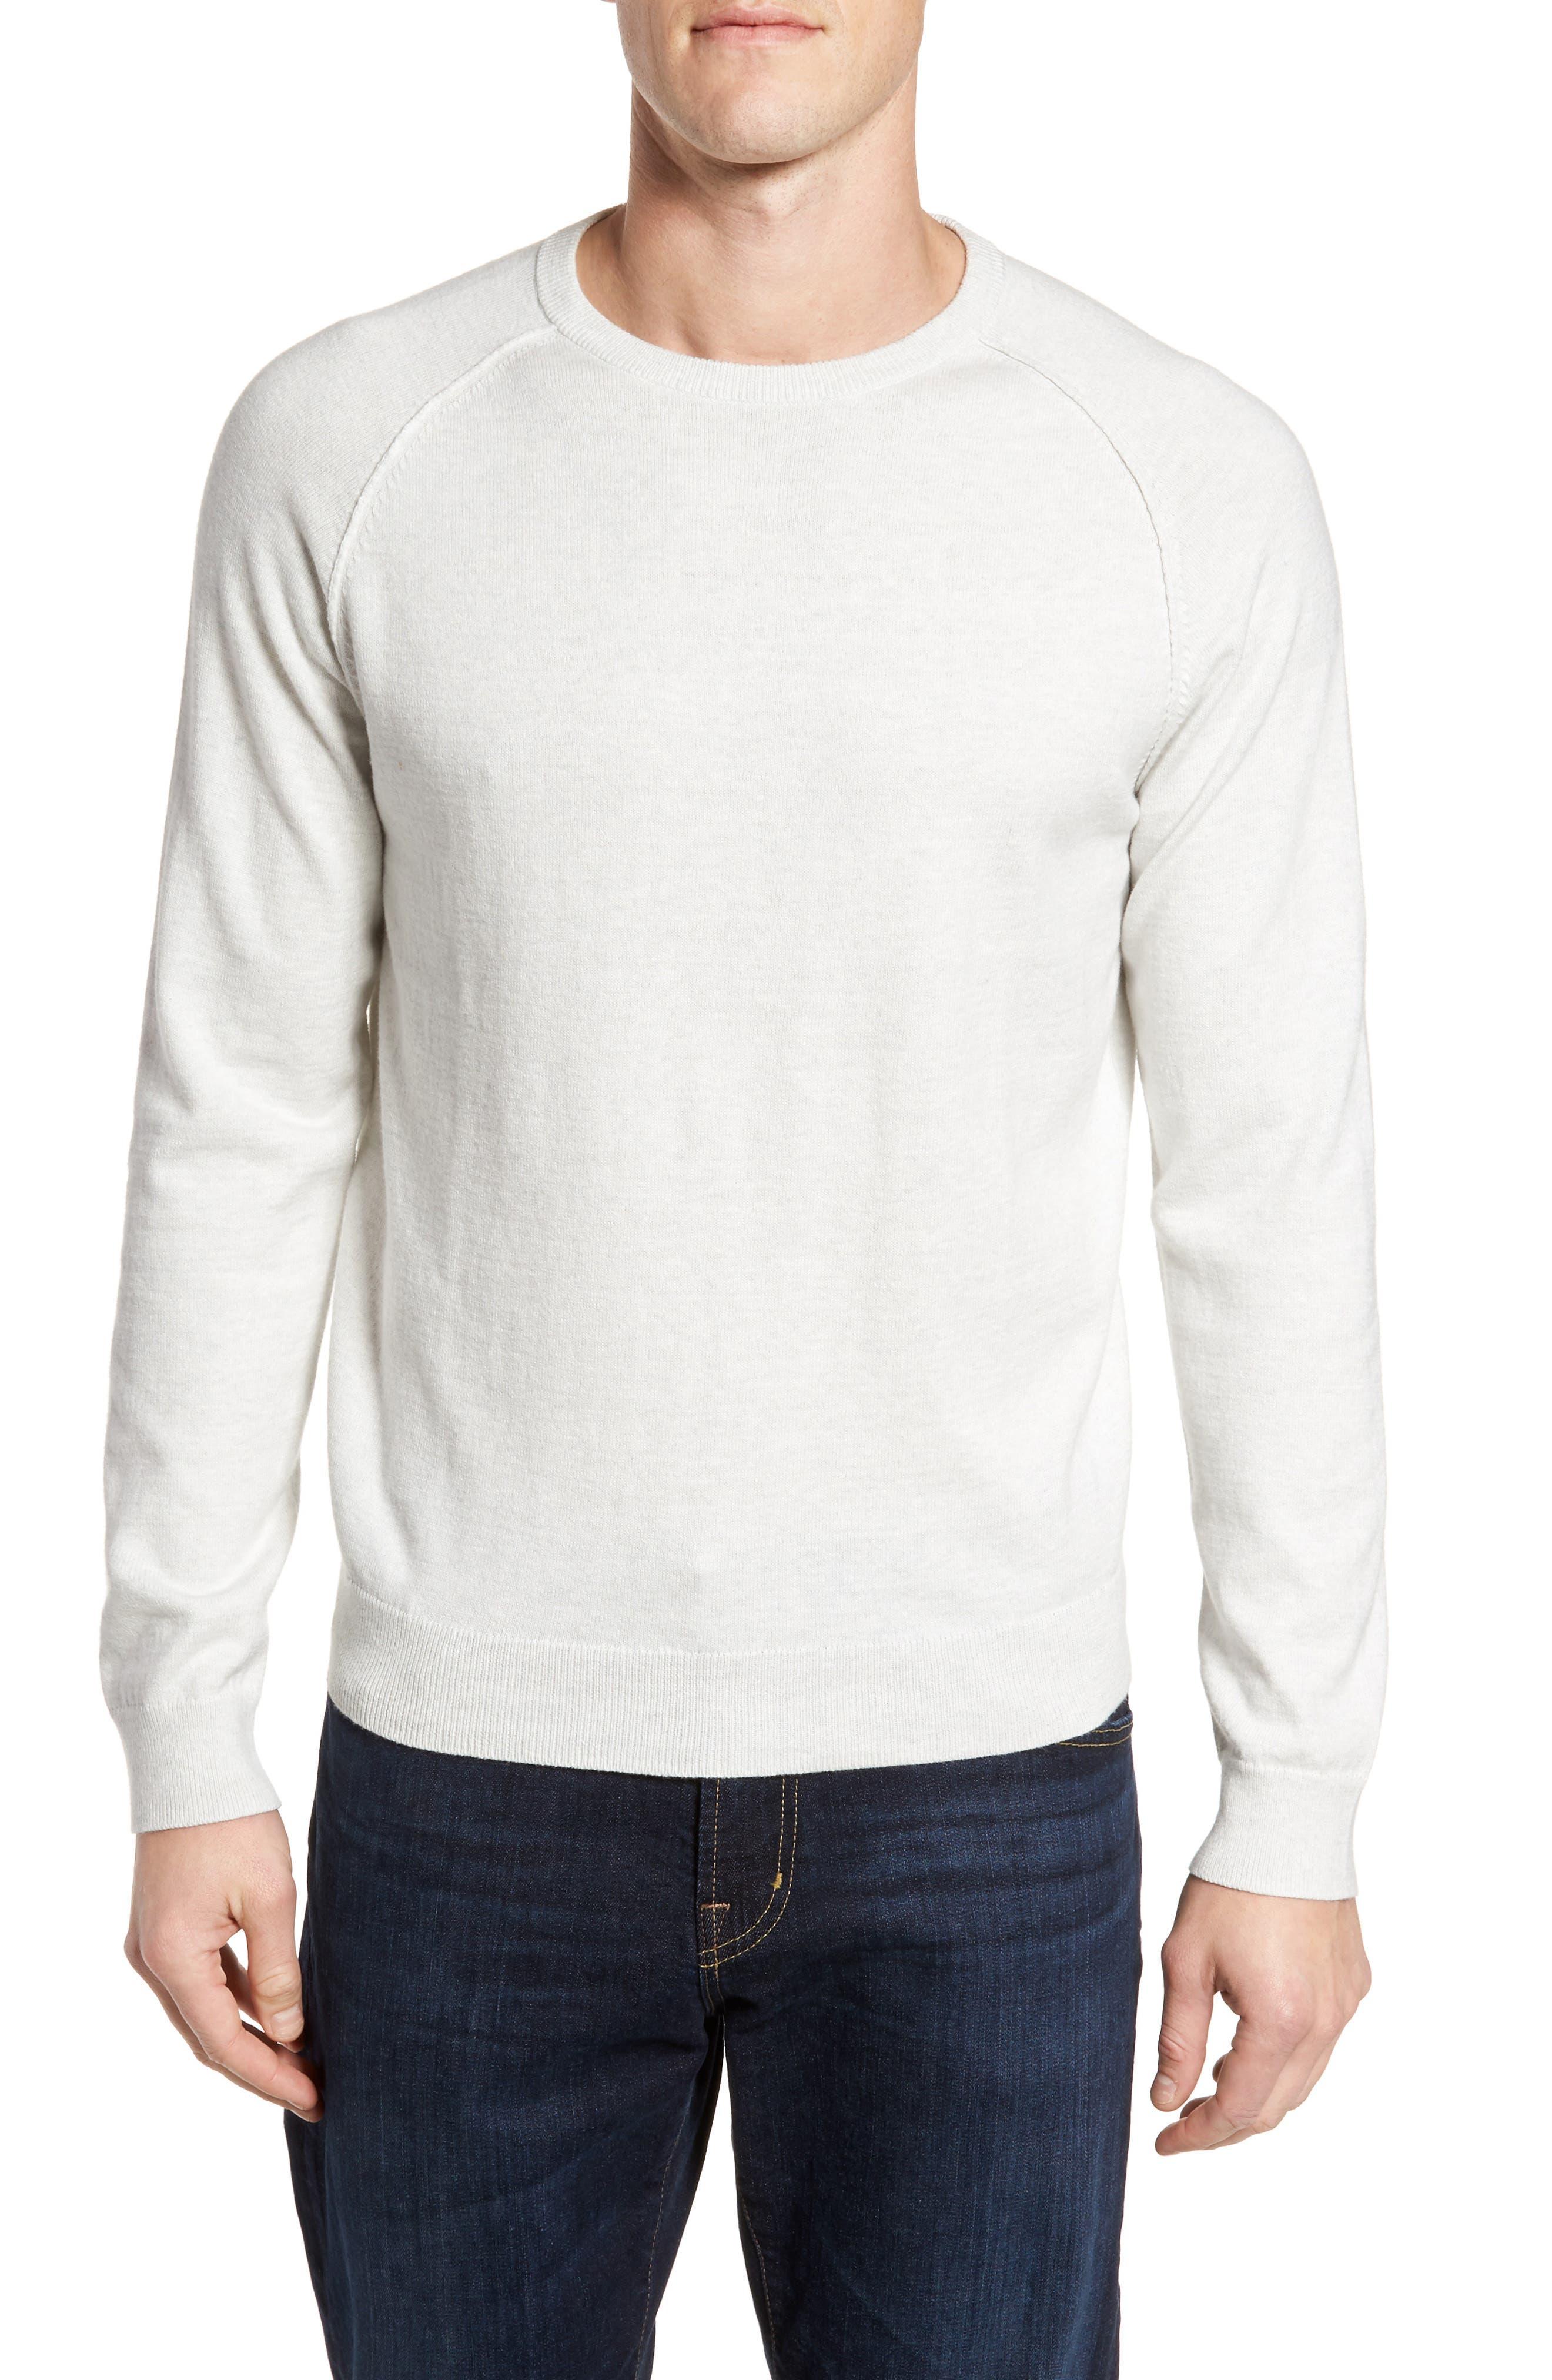 Saddle Shoulder Cotton & Cashmere Sweater,                             Main thumbnail 1, color,                             White Marl